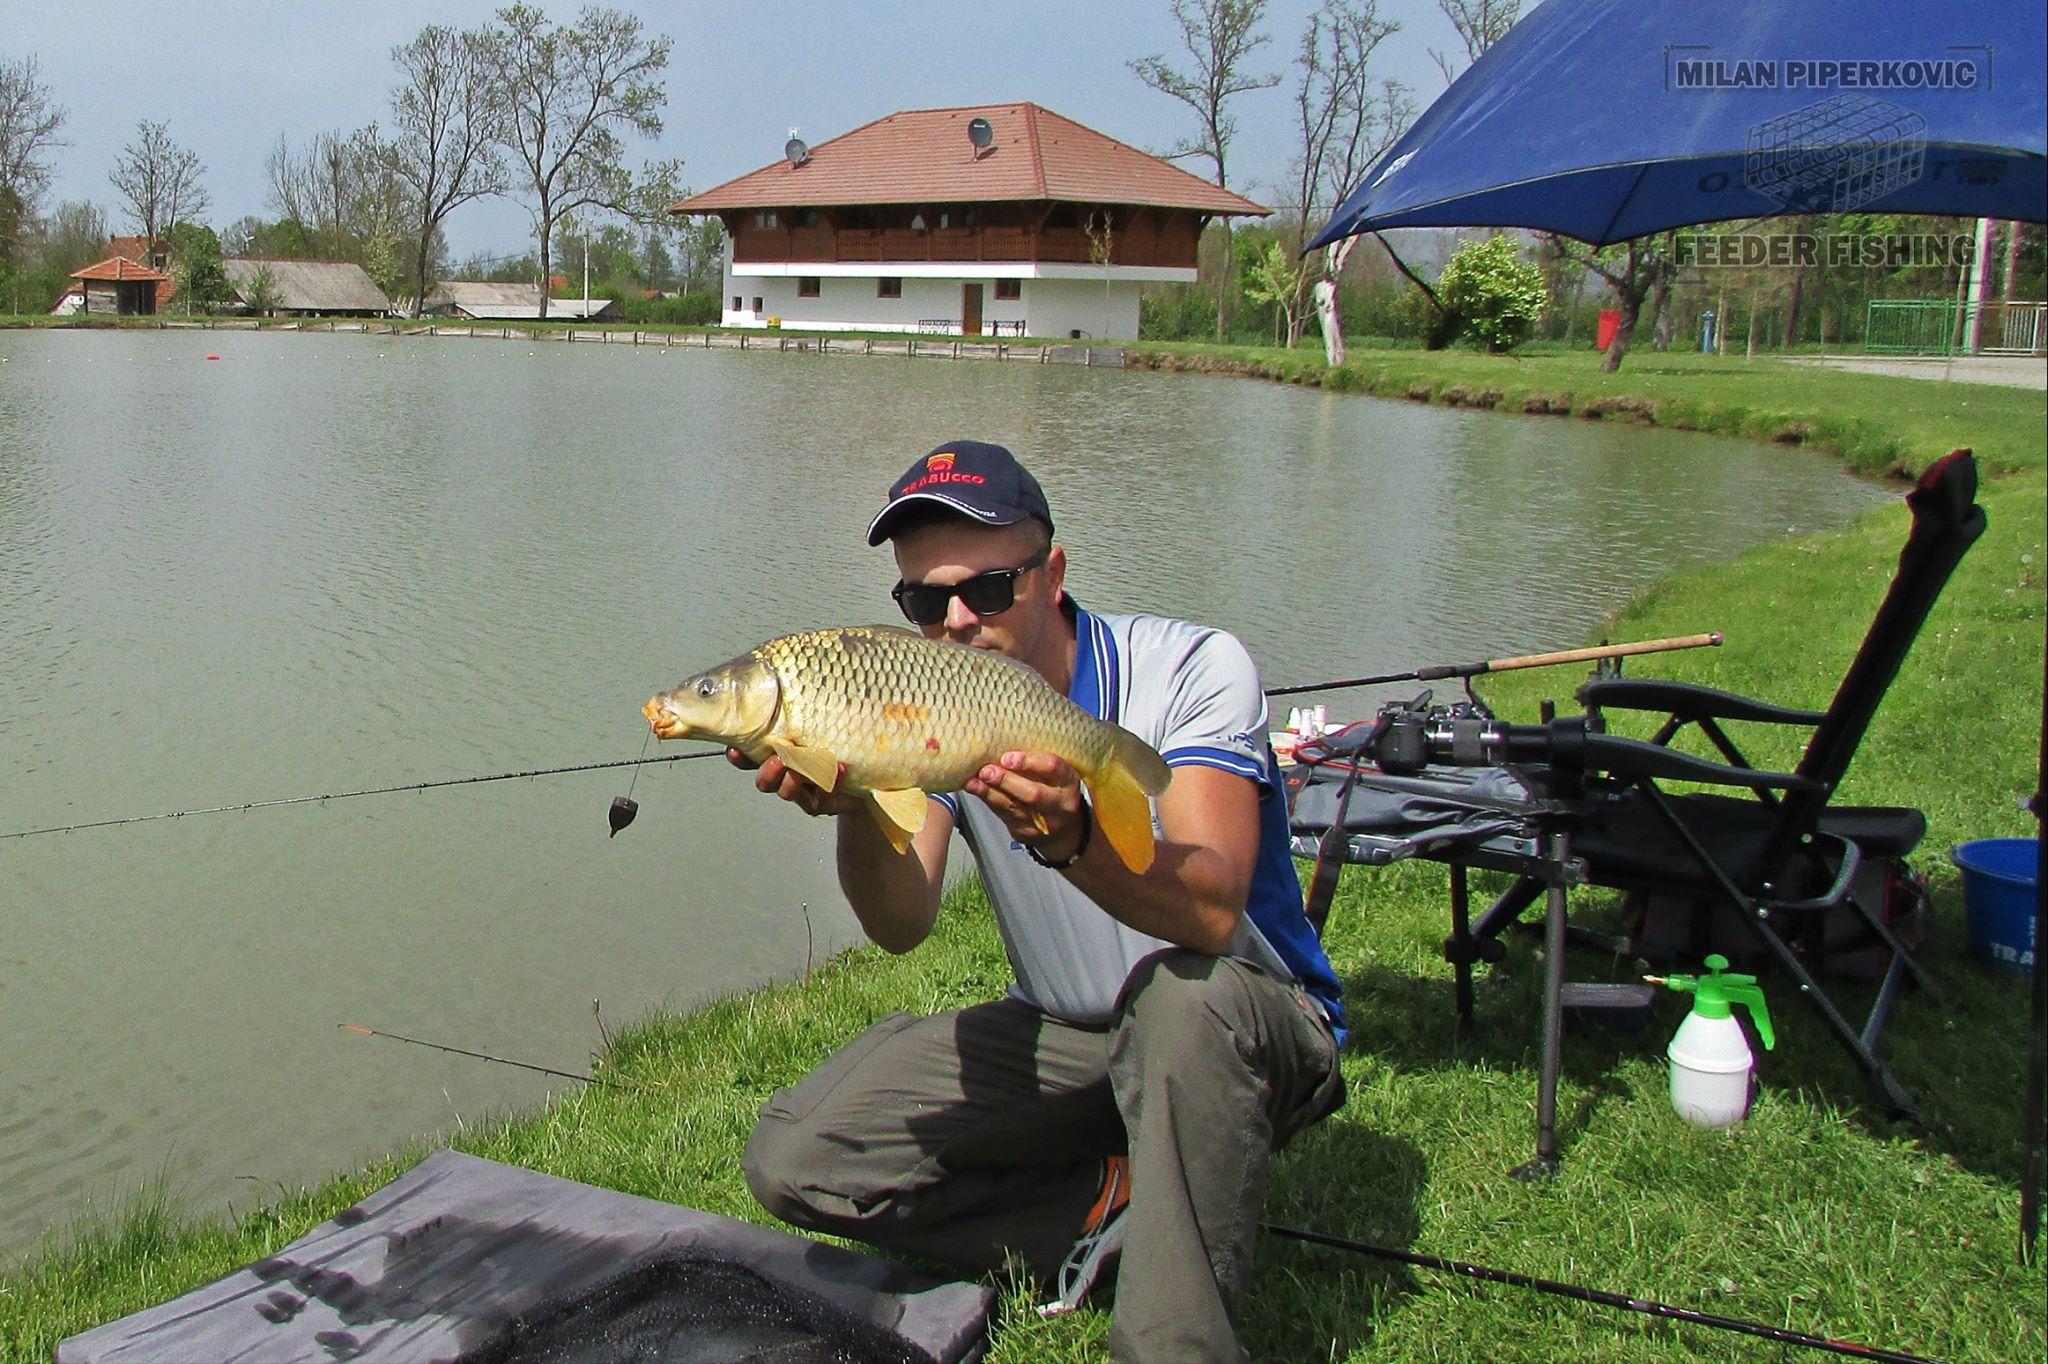 Method Feeder Fishing